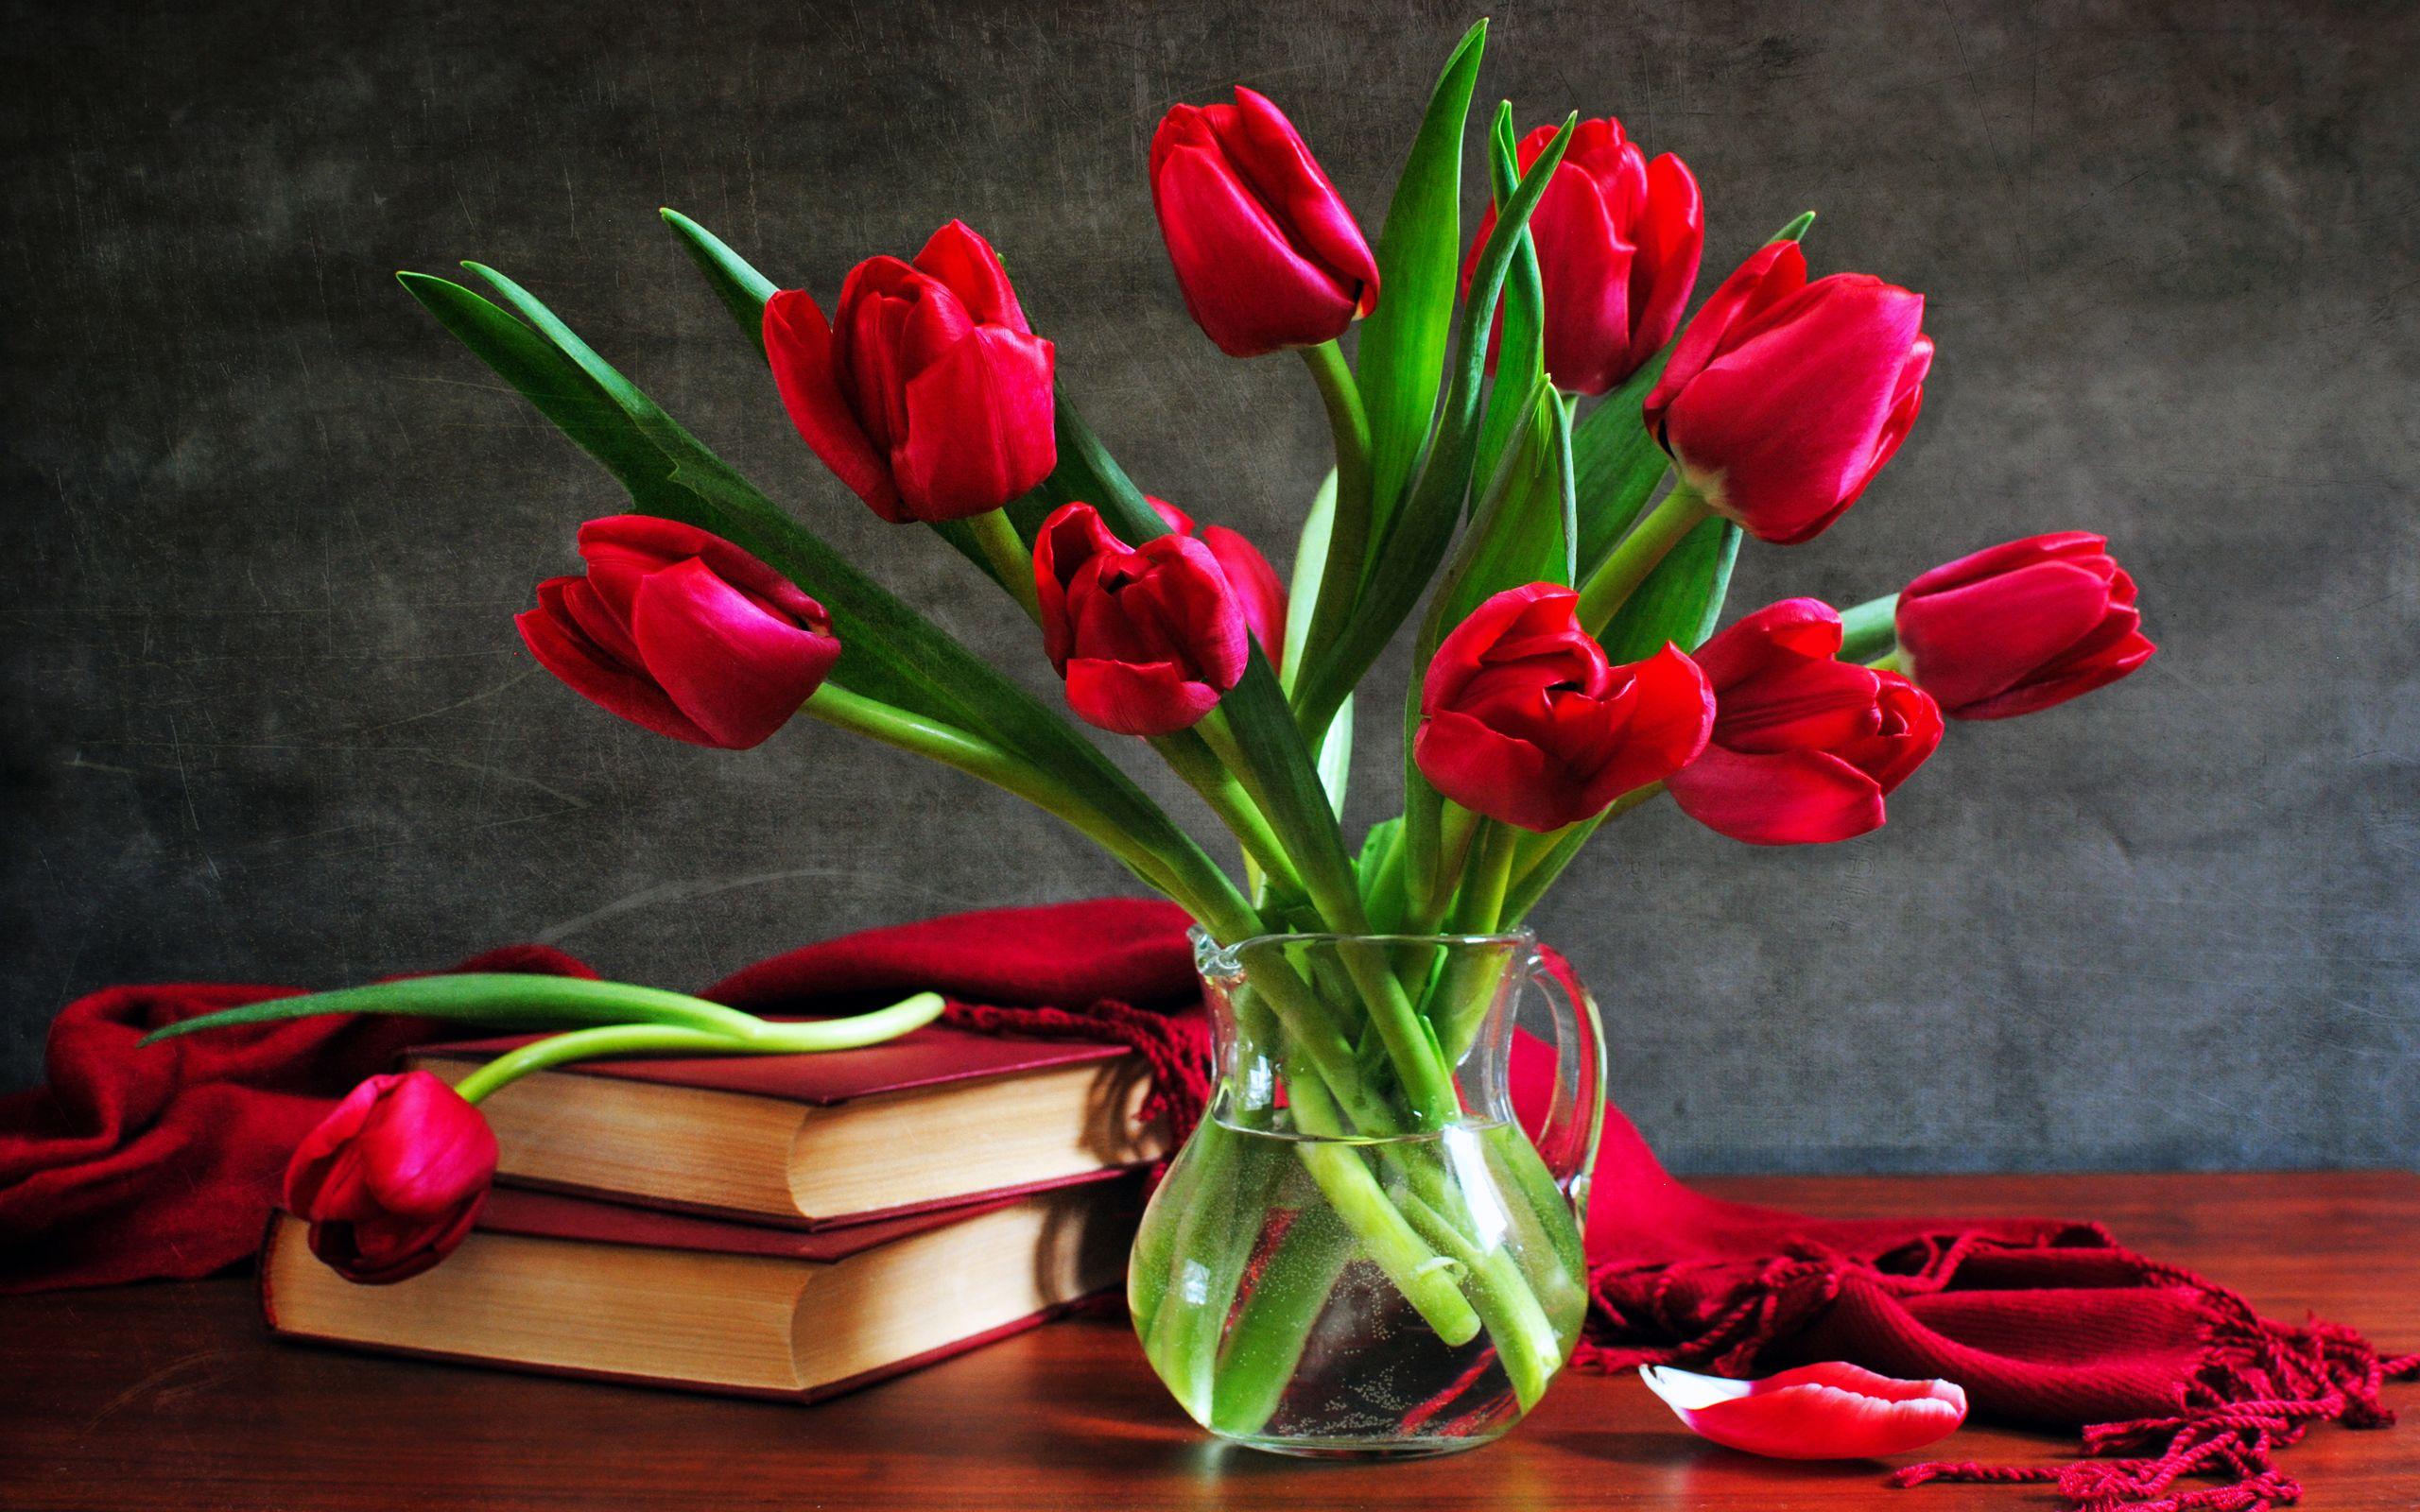 тюльпаны ваза море  № 1012788 бесплатно